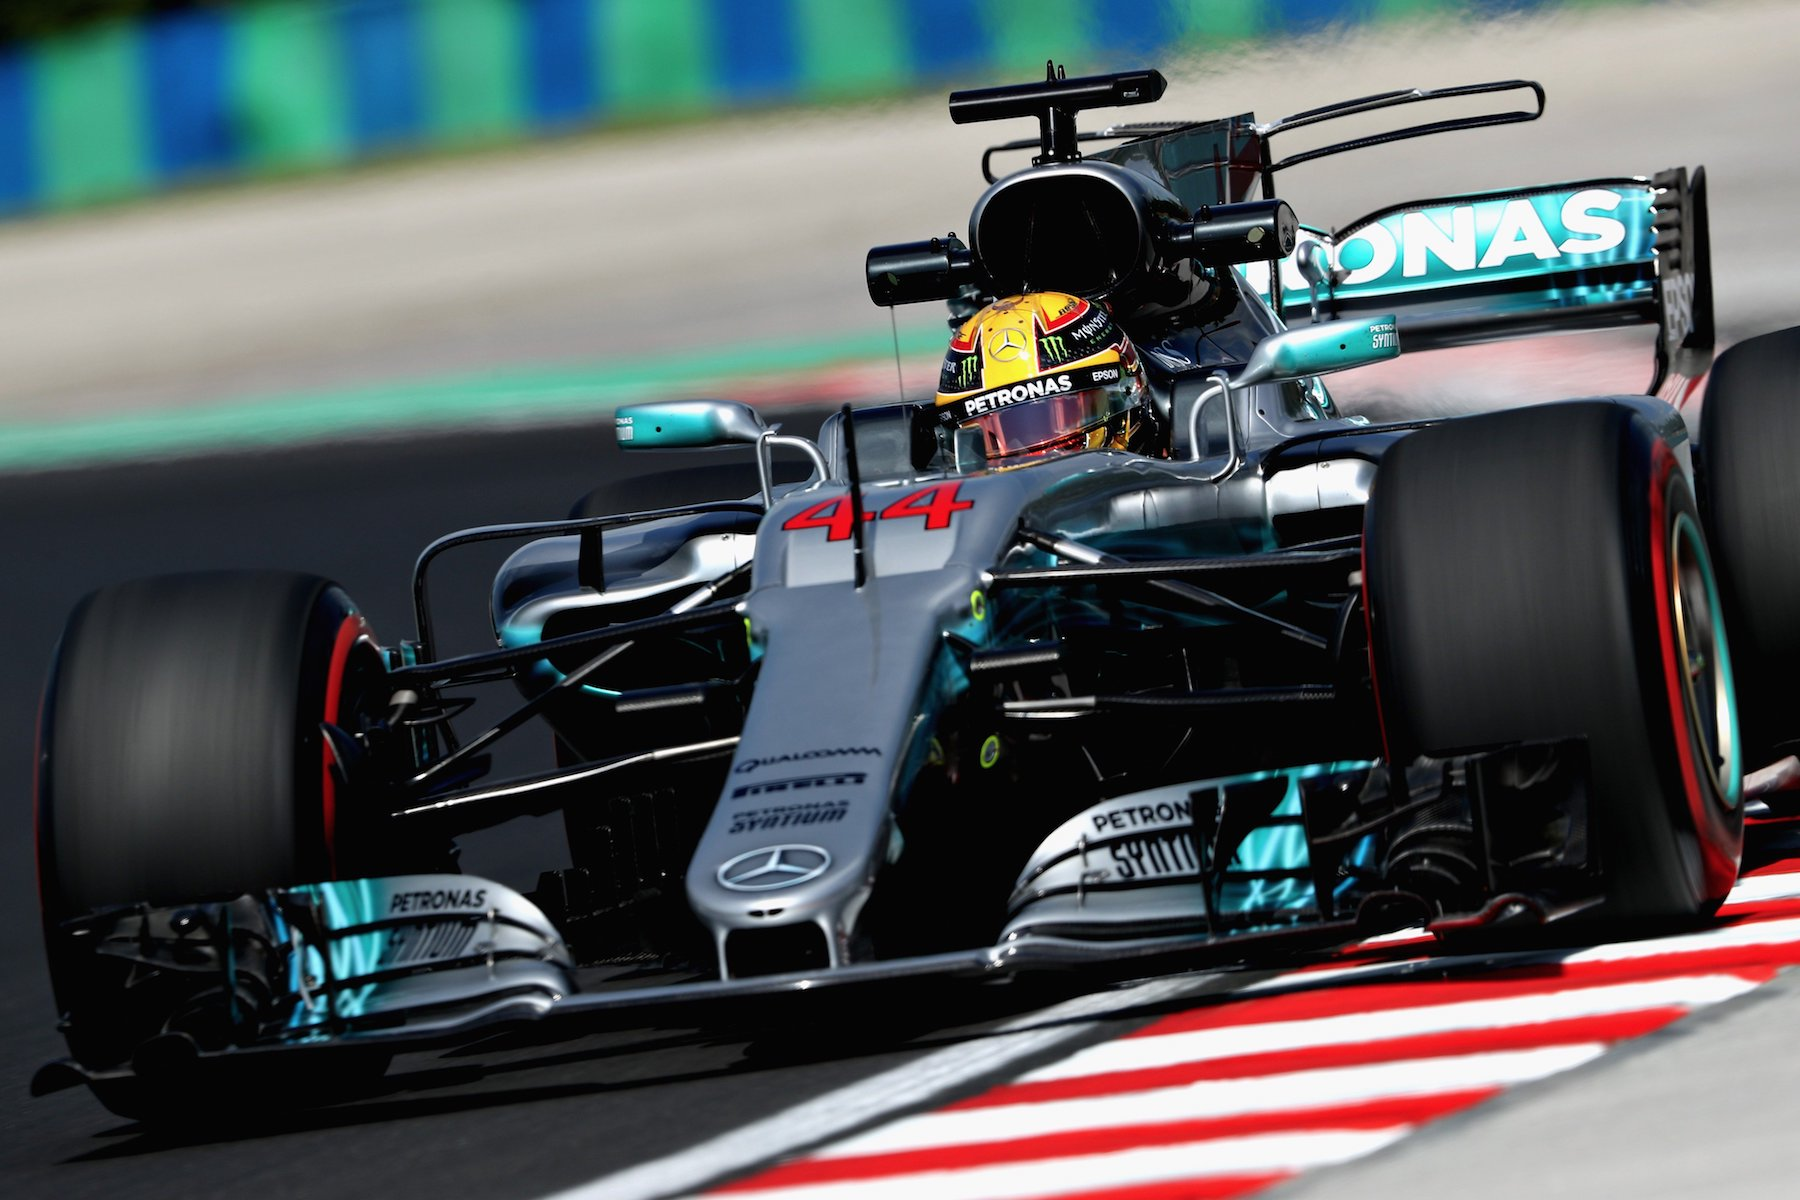 2017 Lewis Hamilton | Mercedes W08 | 2017 Hungarian GP FP1 2 copy.jpg